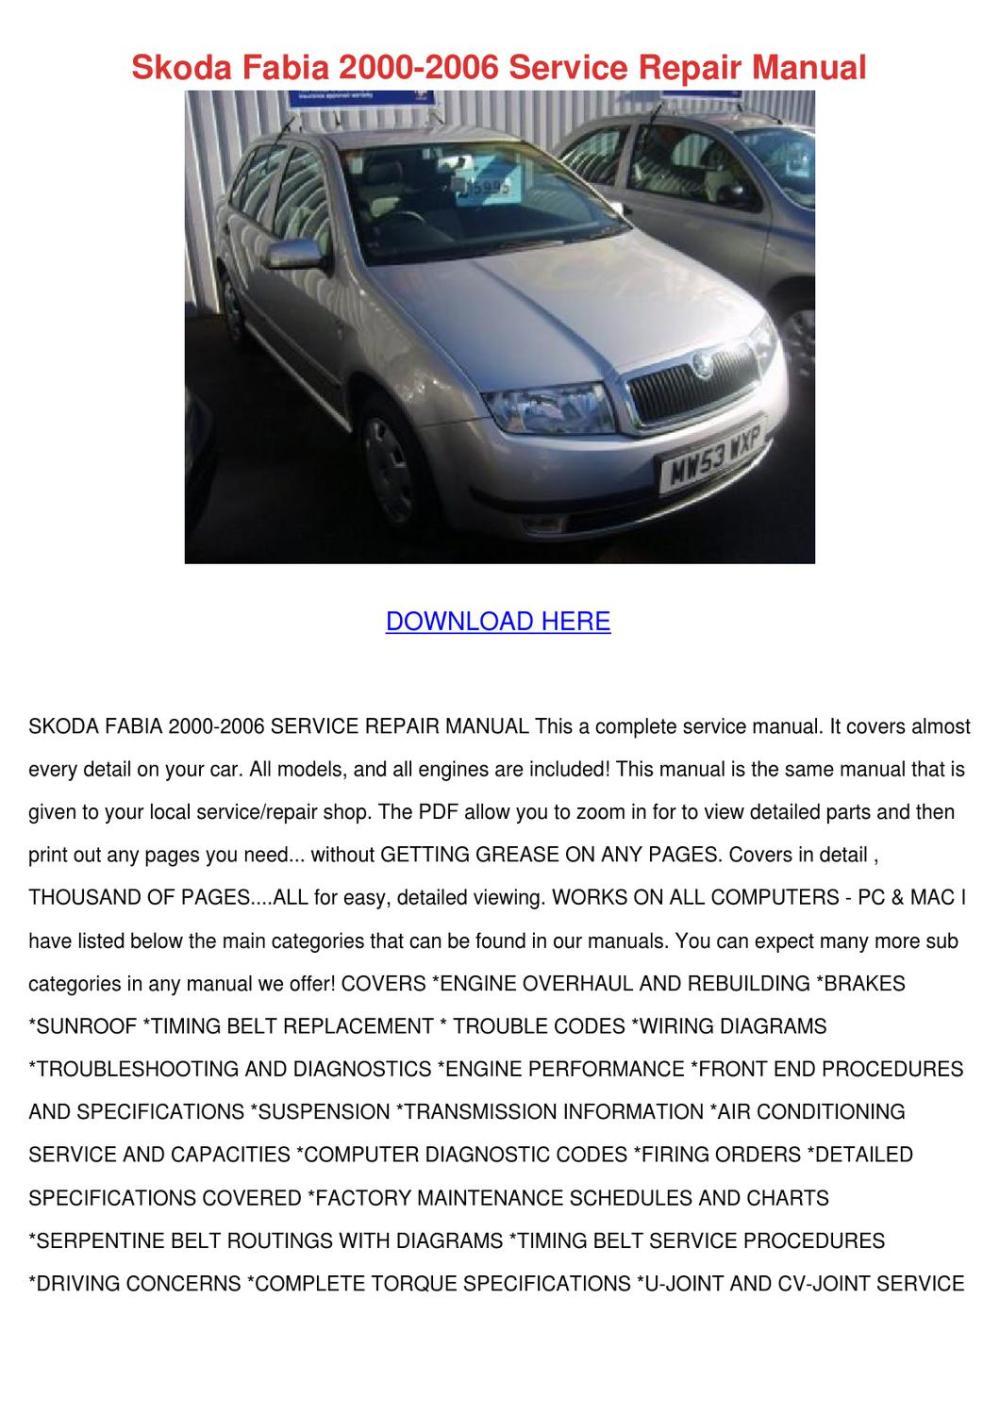 medium resolution of skoda fabia 2000 2006 service repair manual